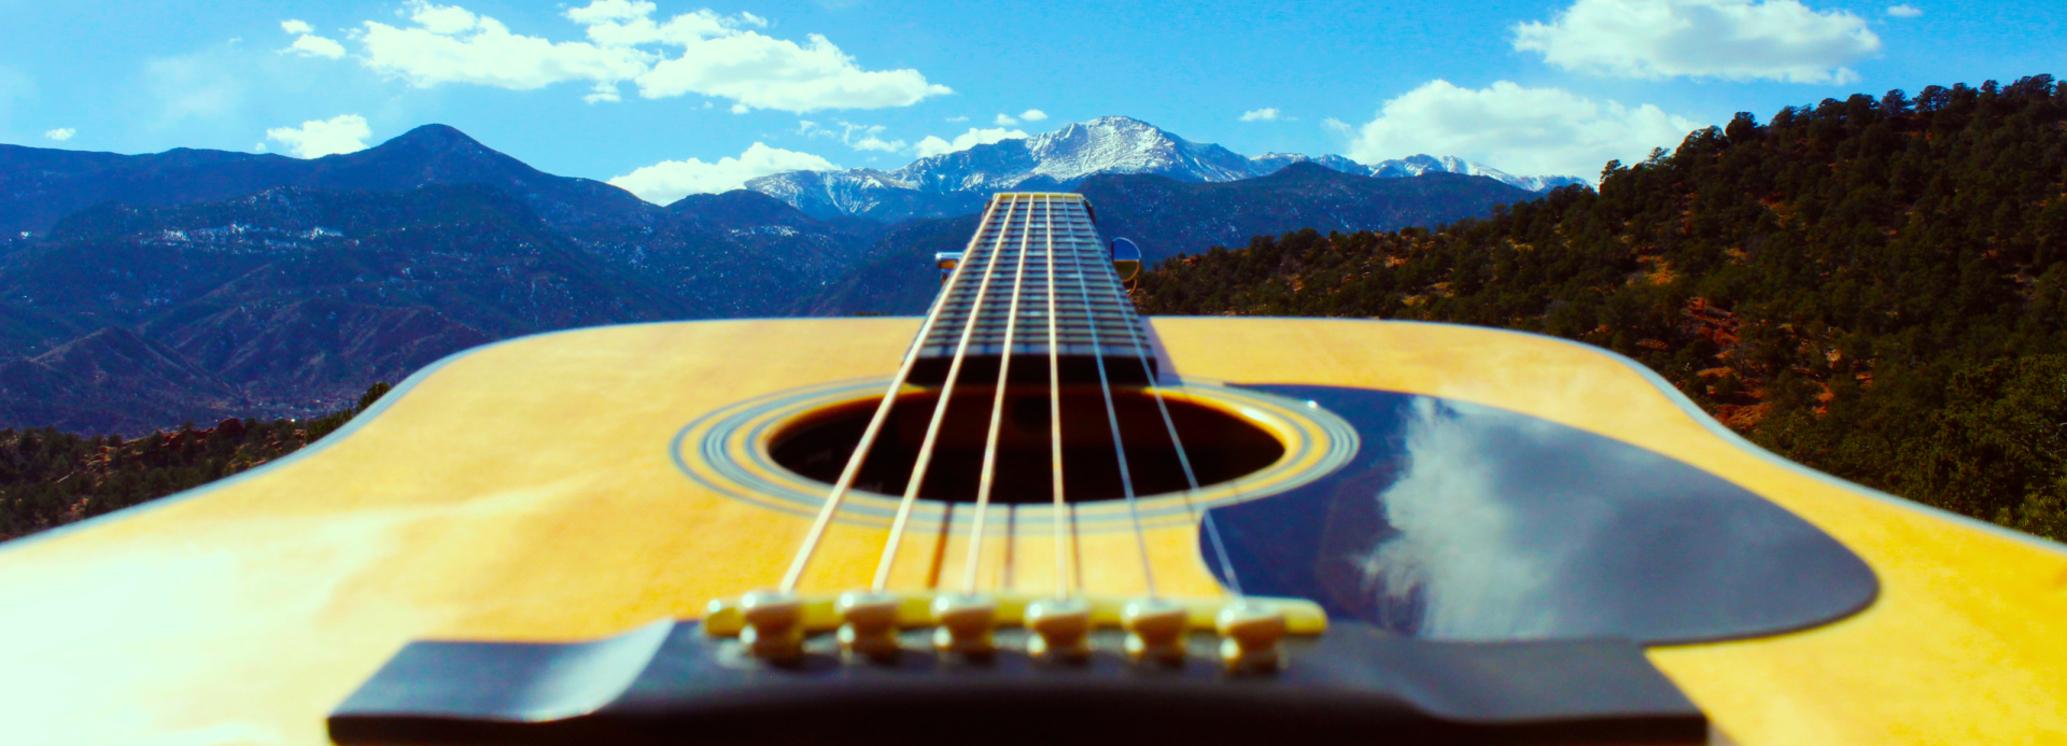 1462578189 guitar mountain focal point copy